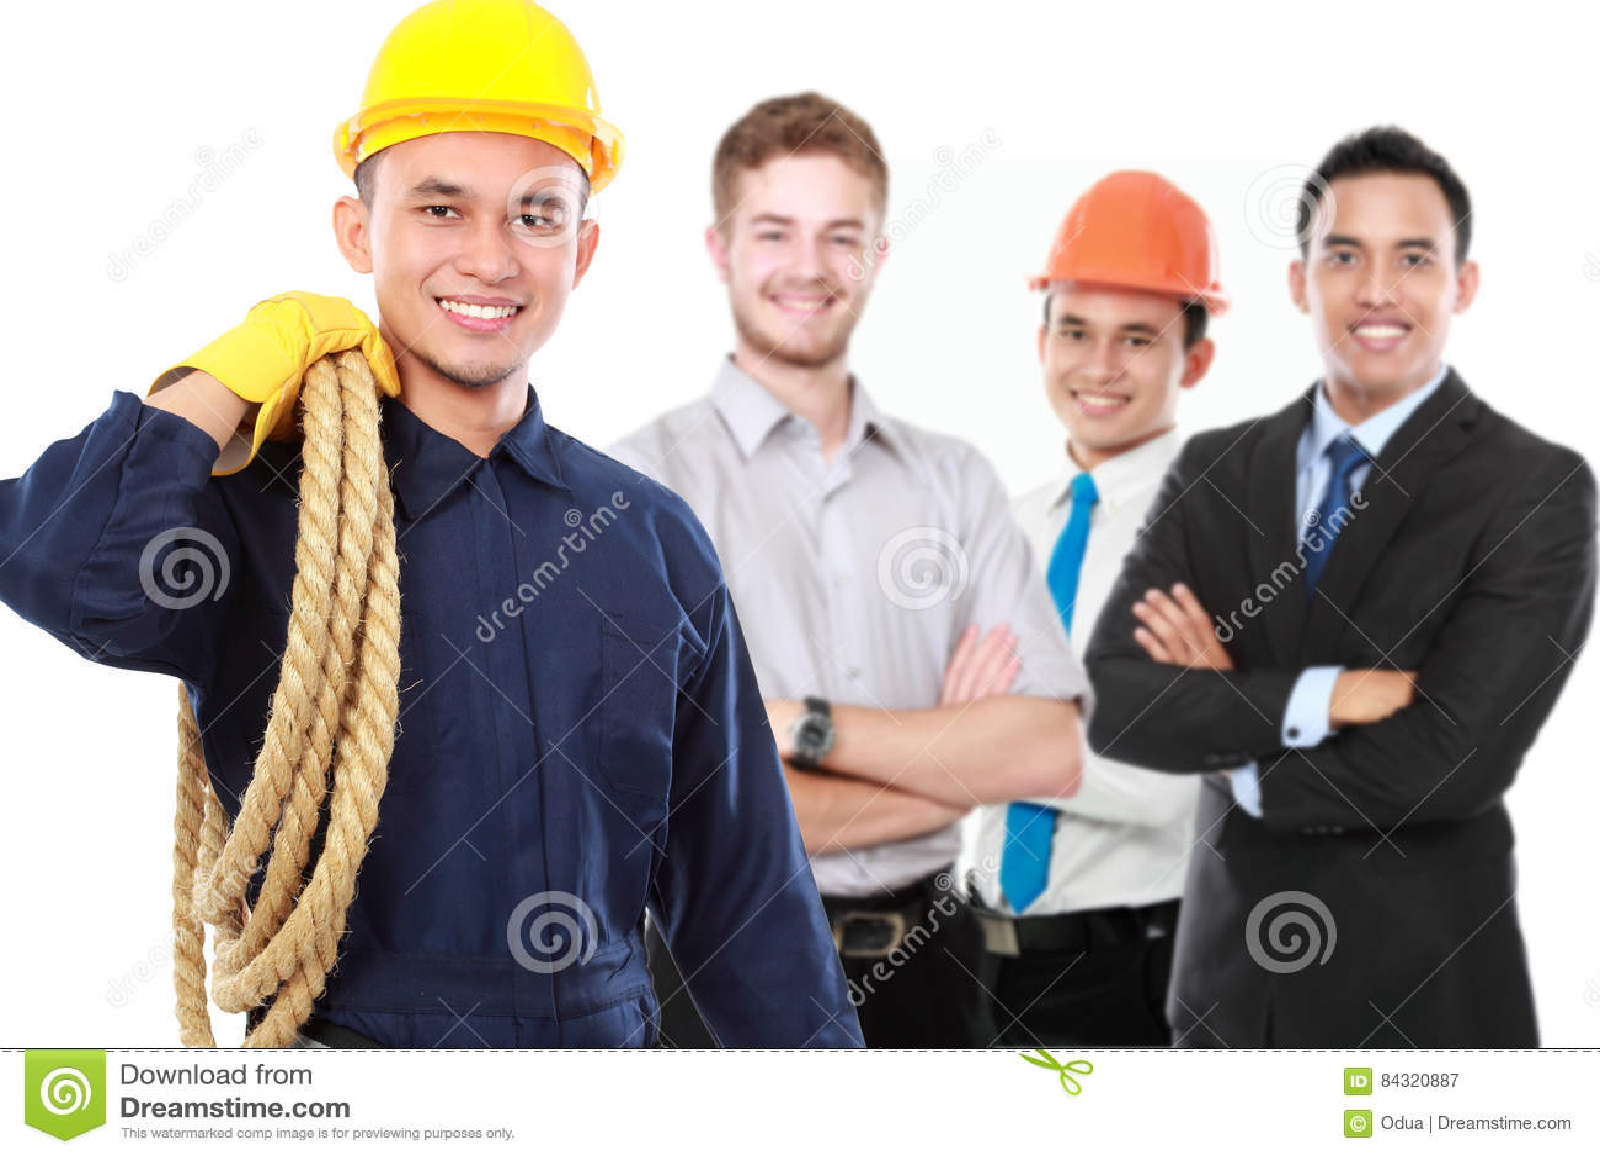 Male technician or engineer